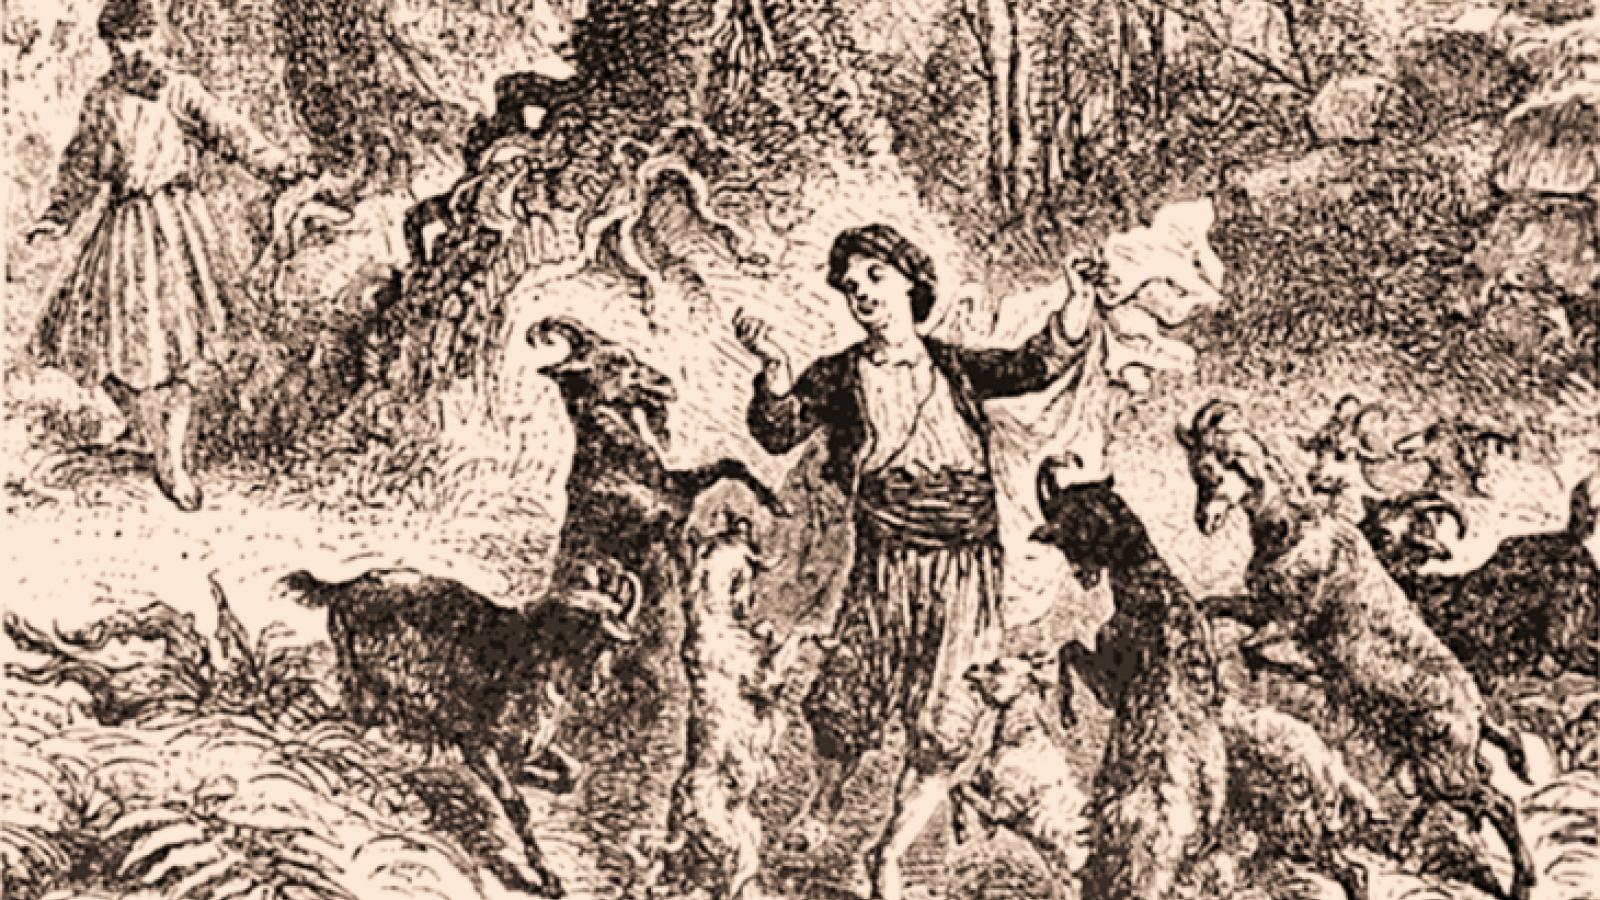 Kaldi and his dancing goats